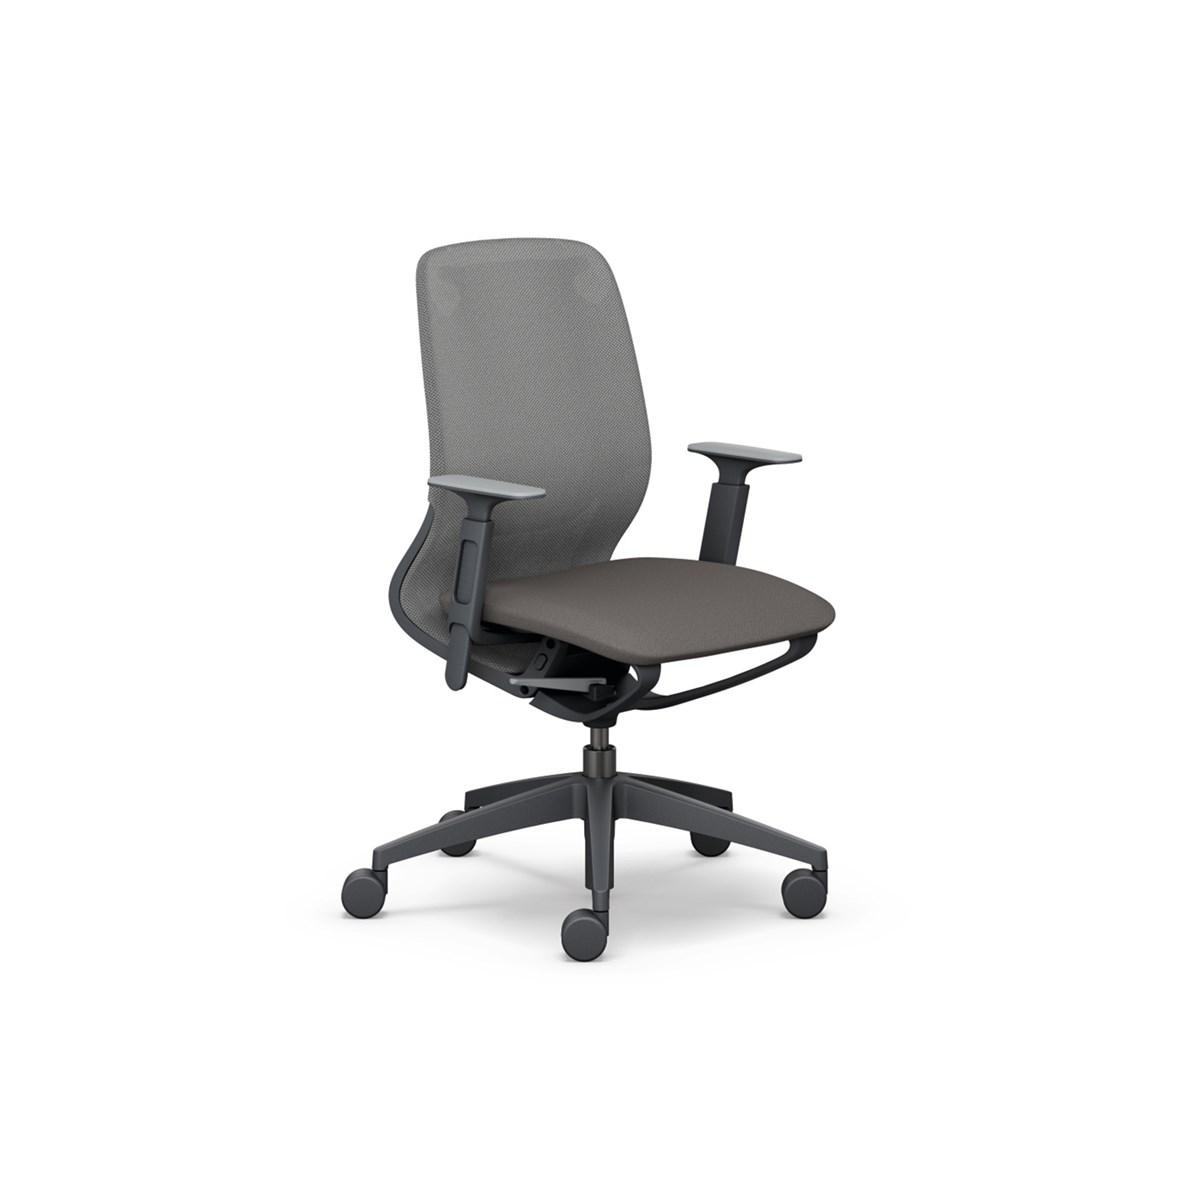 Sedus-Se:motion-Net-Chair-Matisse-1